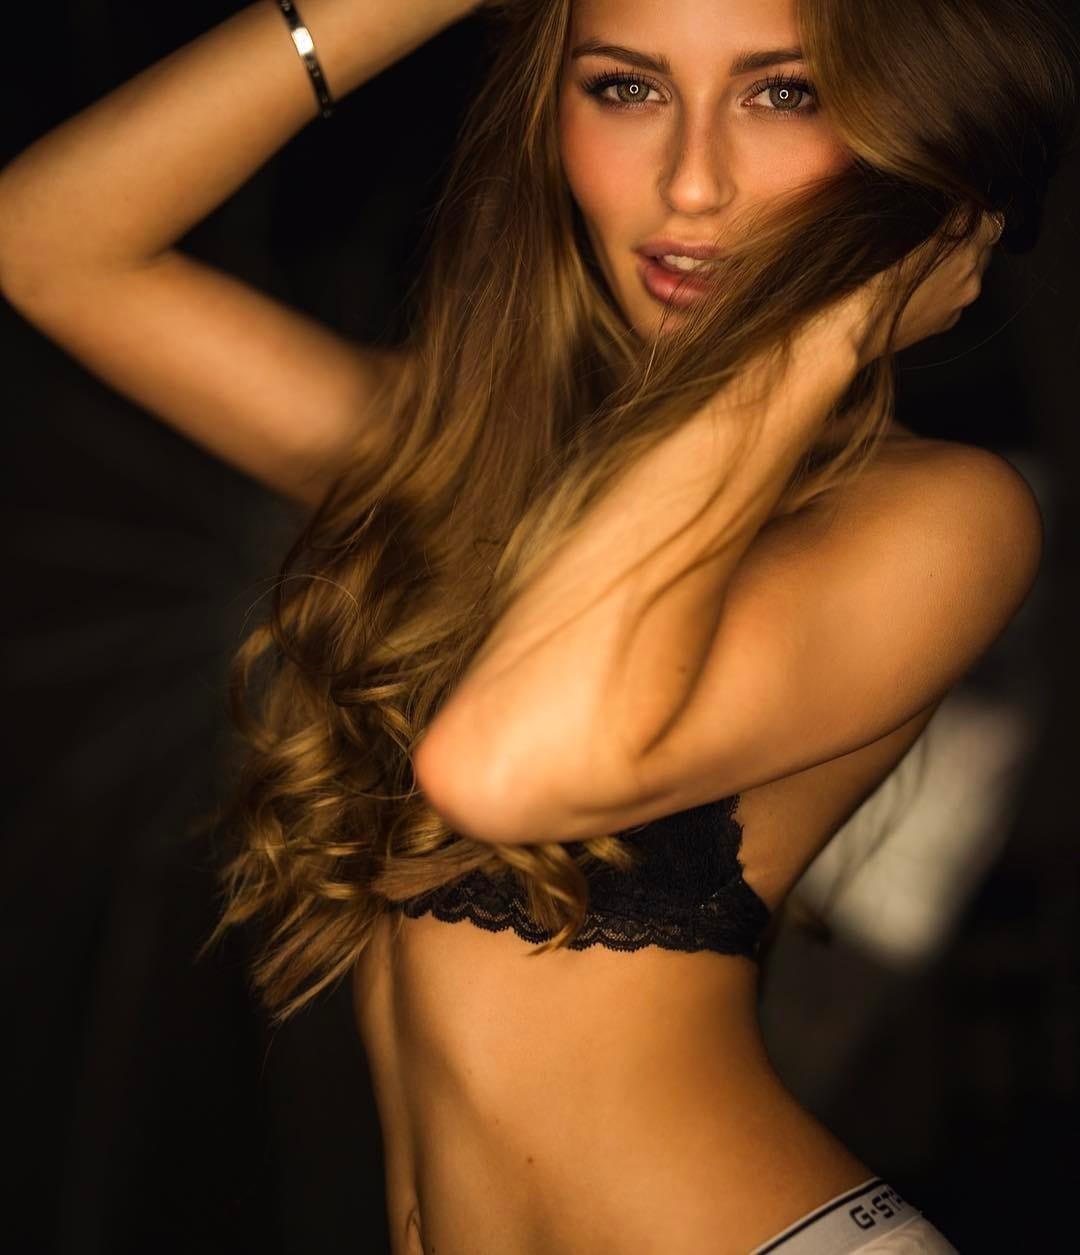 legs Erotica Kristina Levina naked photo 2017